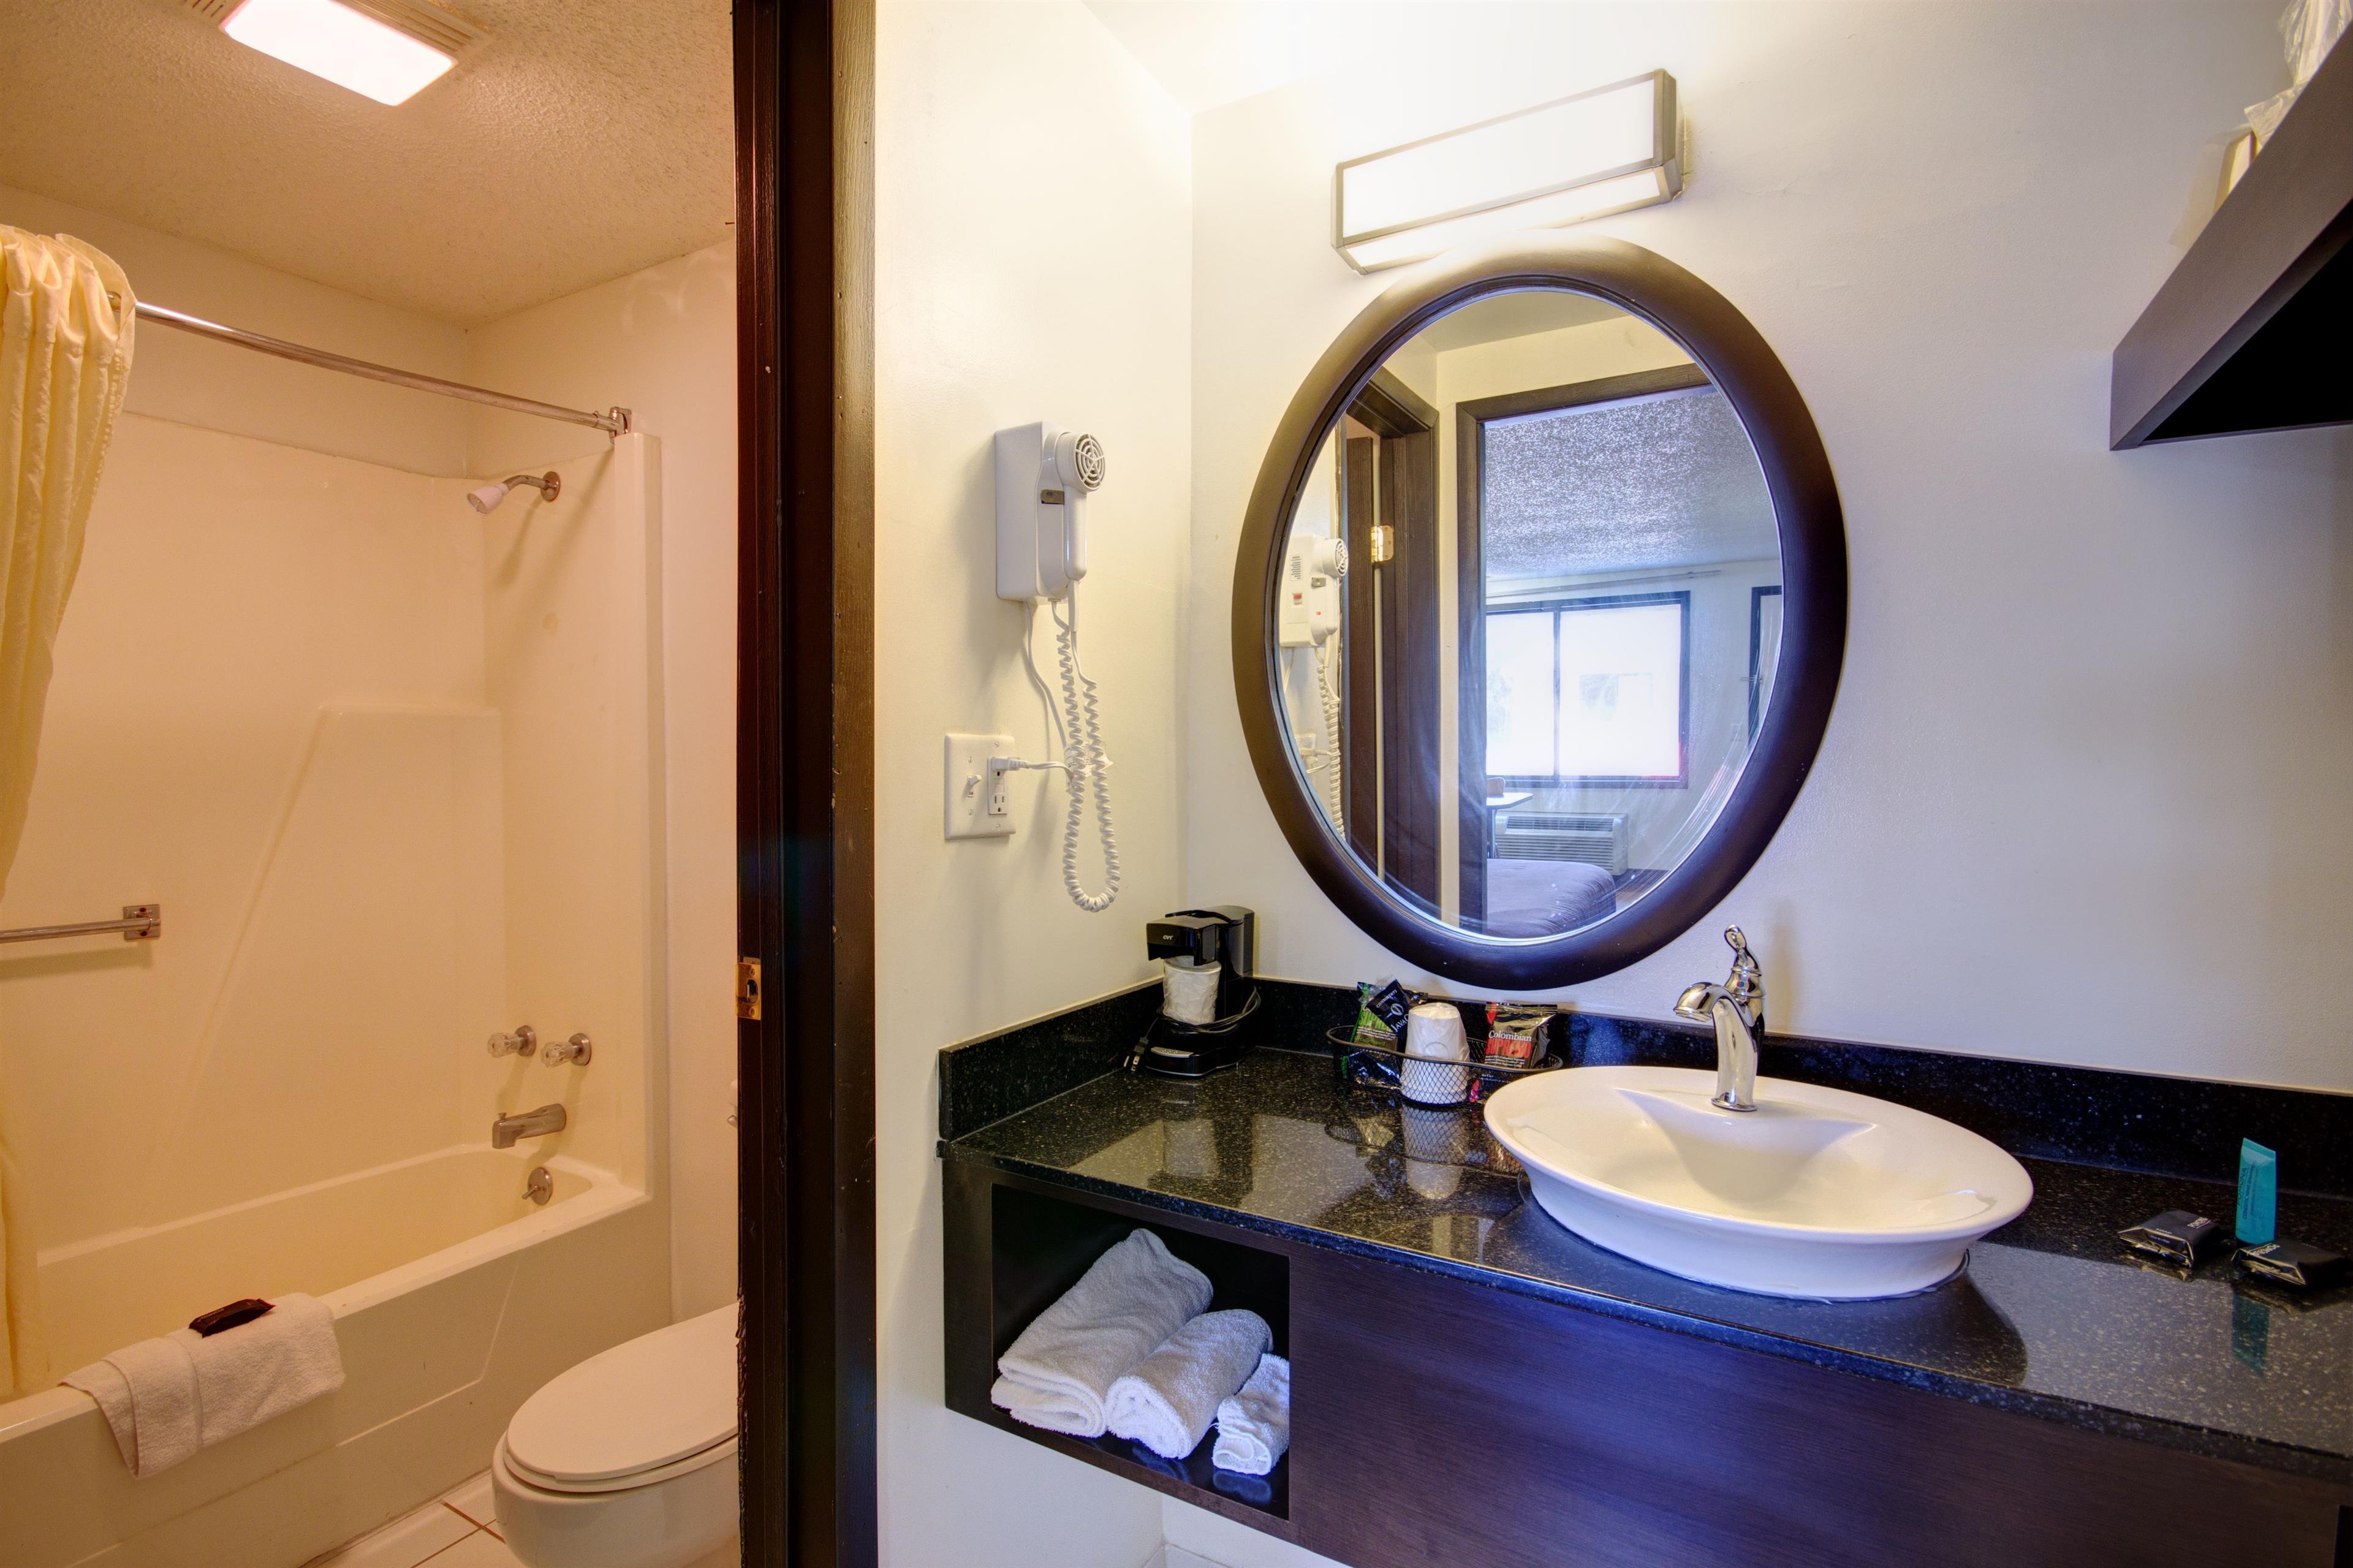 Americas Best Value Inn - Heath/Newark image 16